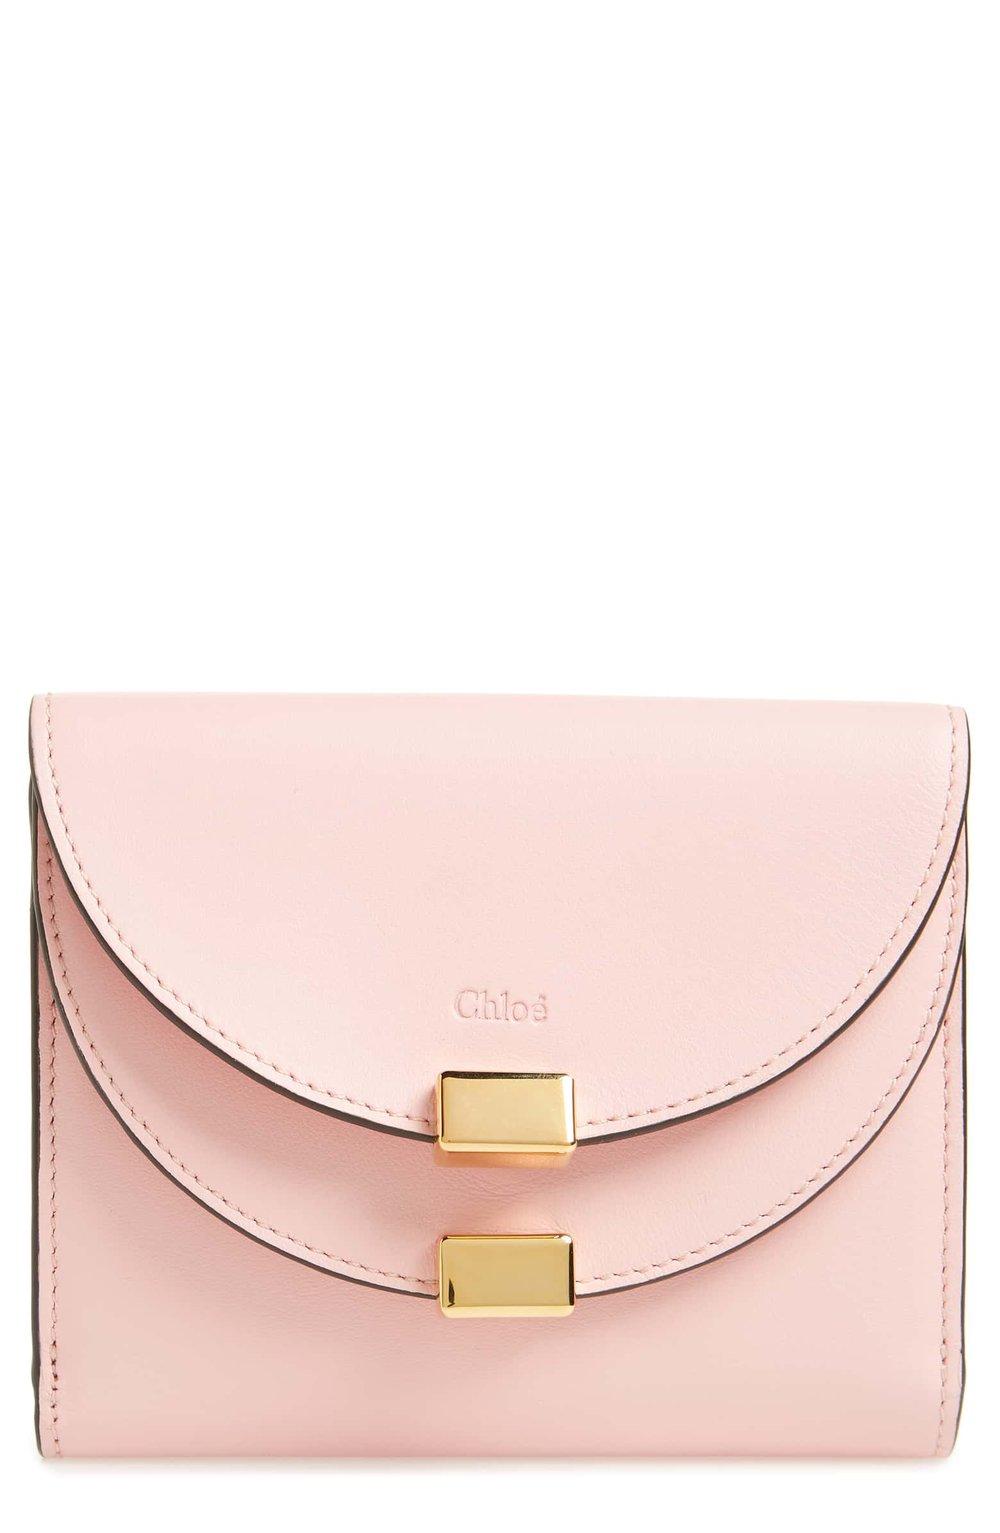 chloe square leather wallet.jpg